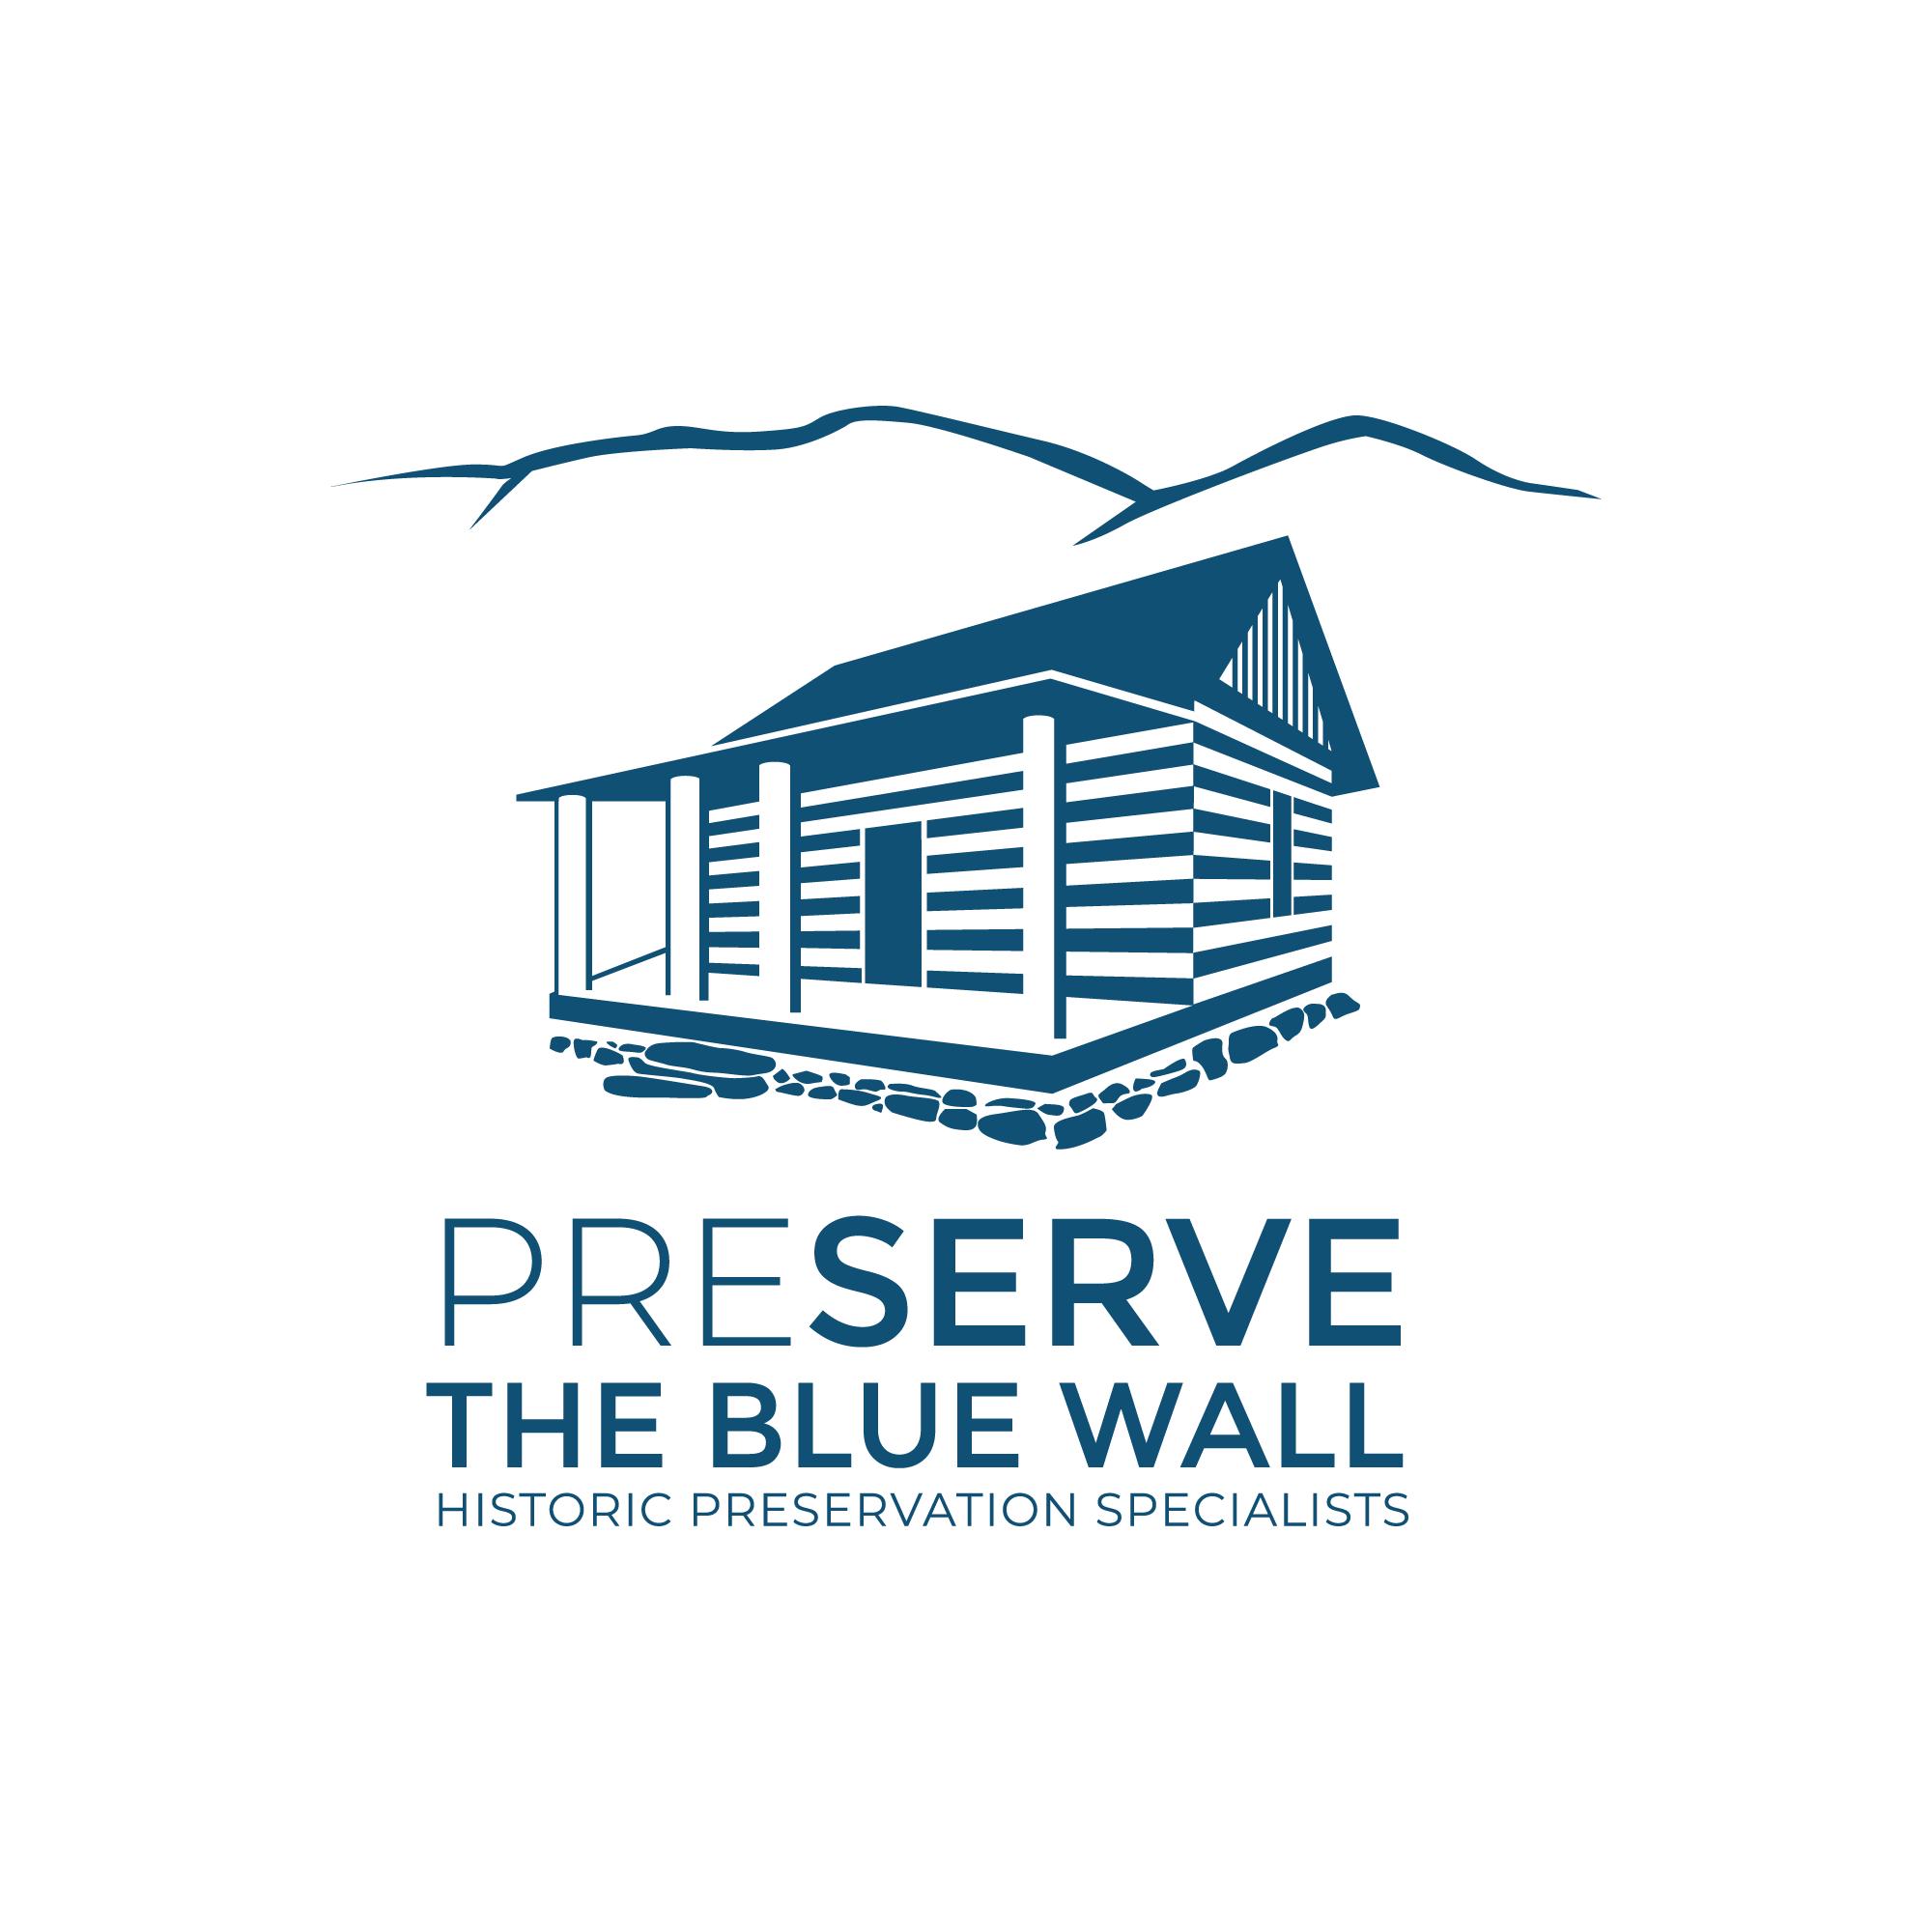 Logo for historic preservation organization